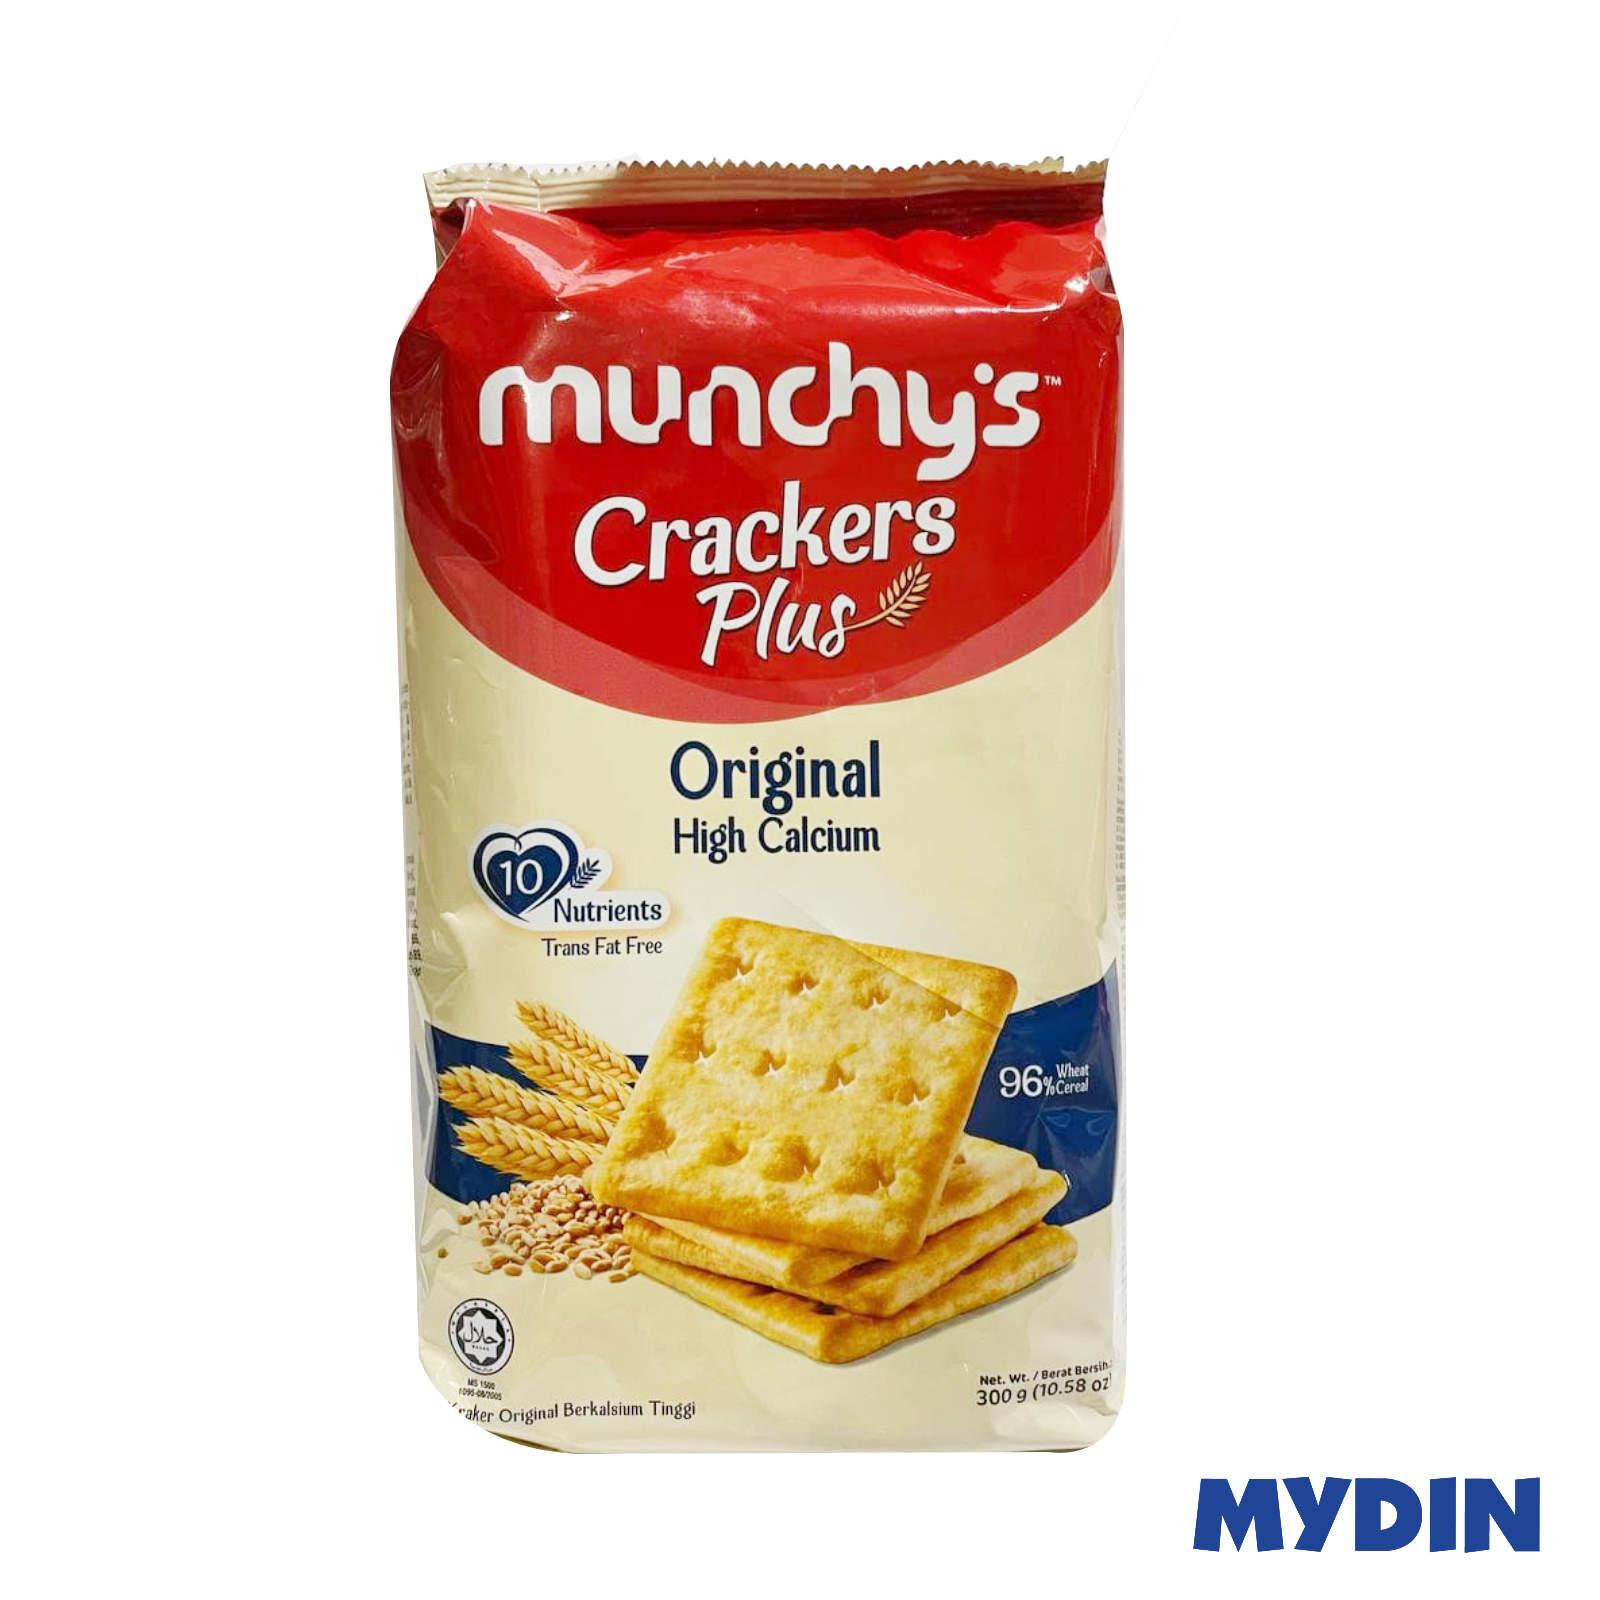 Munchy's Cracker Plus Original High Calsium 300g